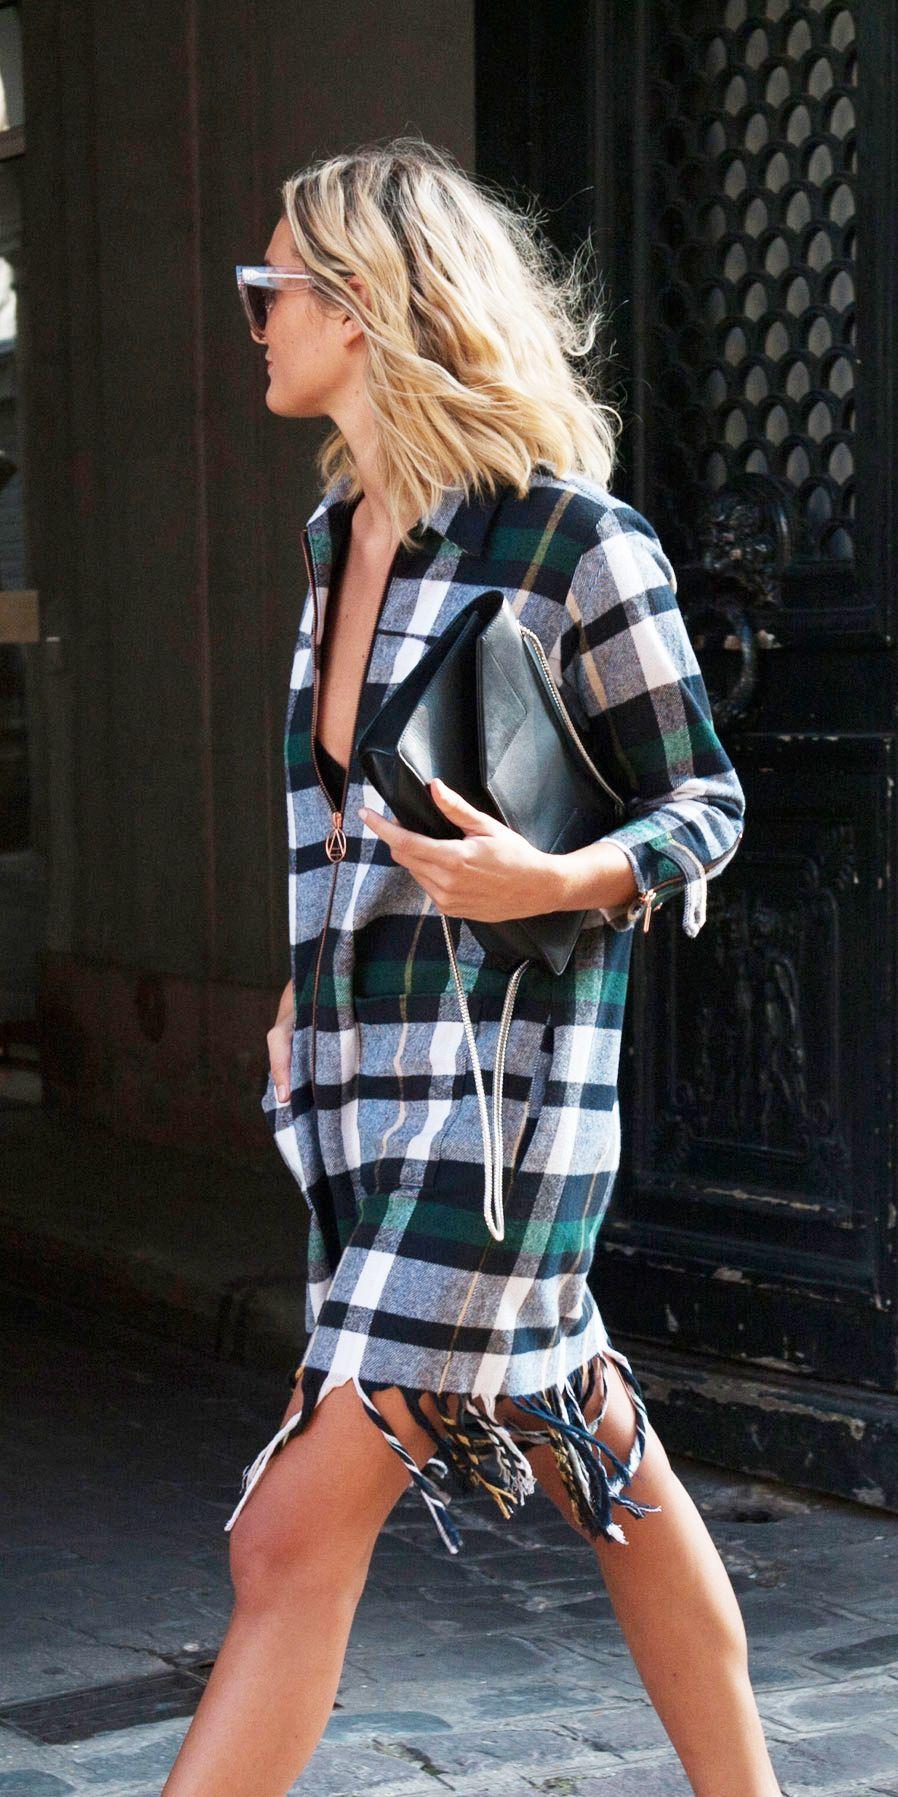 Off white flannel coat  fringed plaid dress  Style  Pinterest  Plaid Fringe dress and